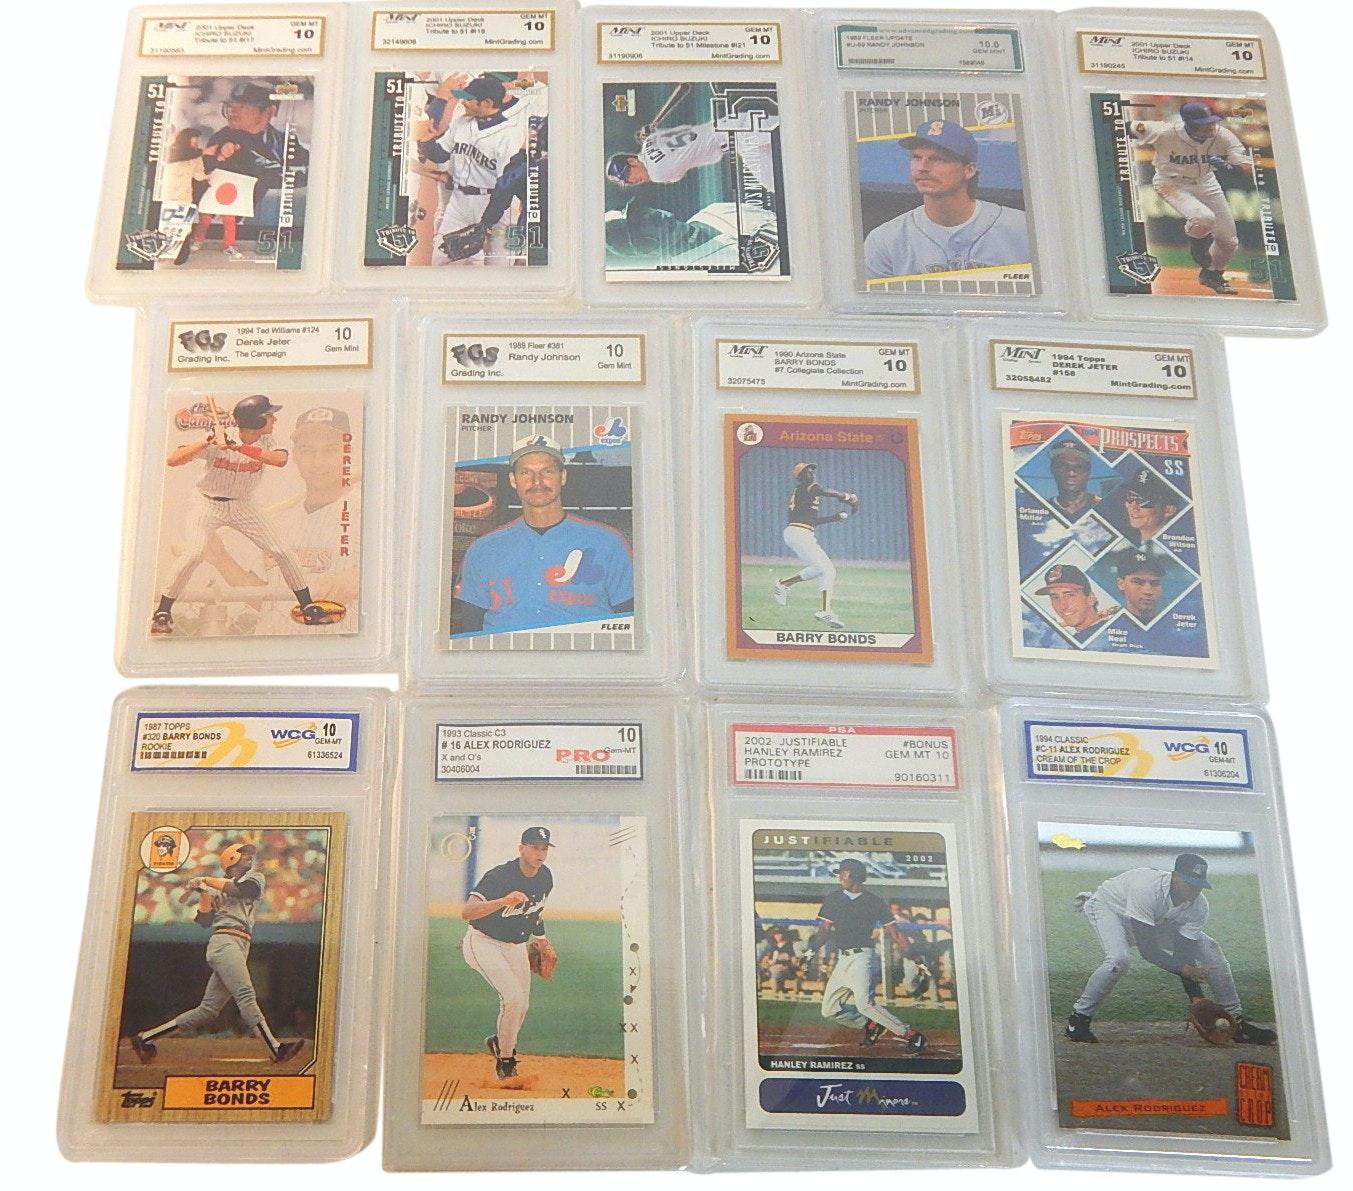 13 Graded Baseball Rookie GEM-MT 10 Cards - Jeter, Ichiro, Bonds